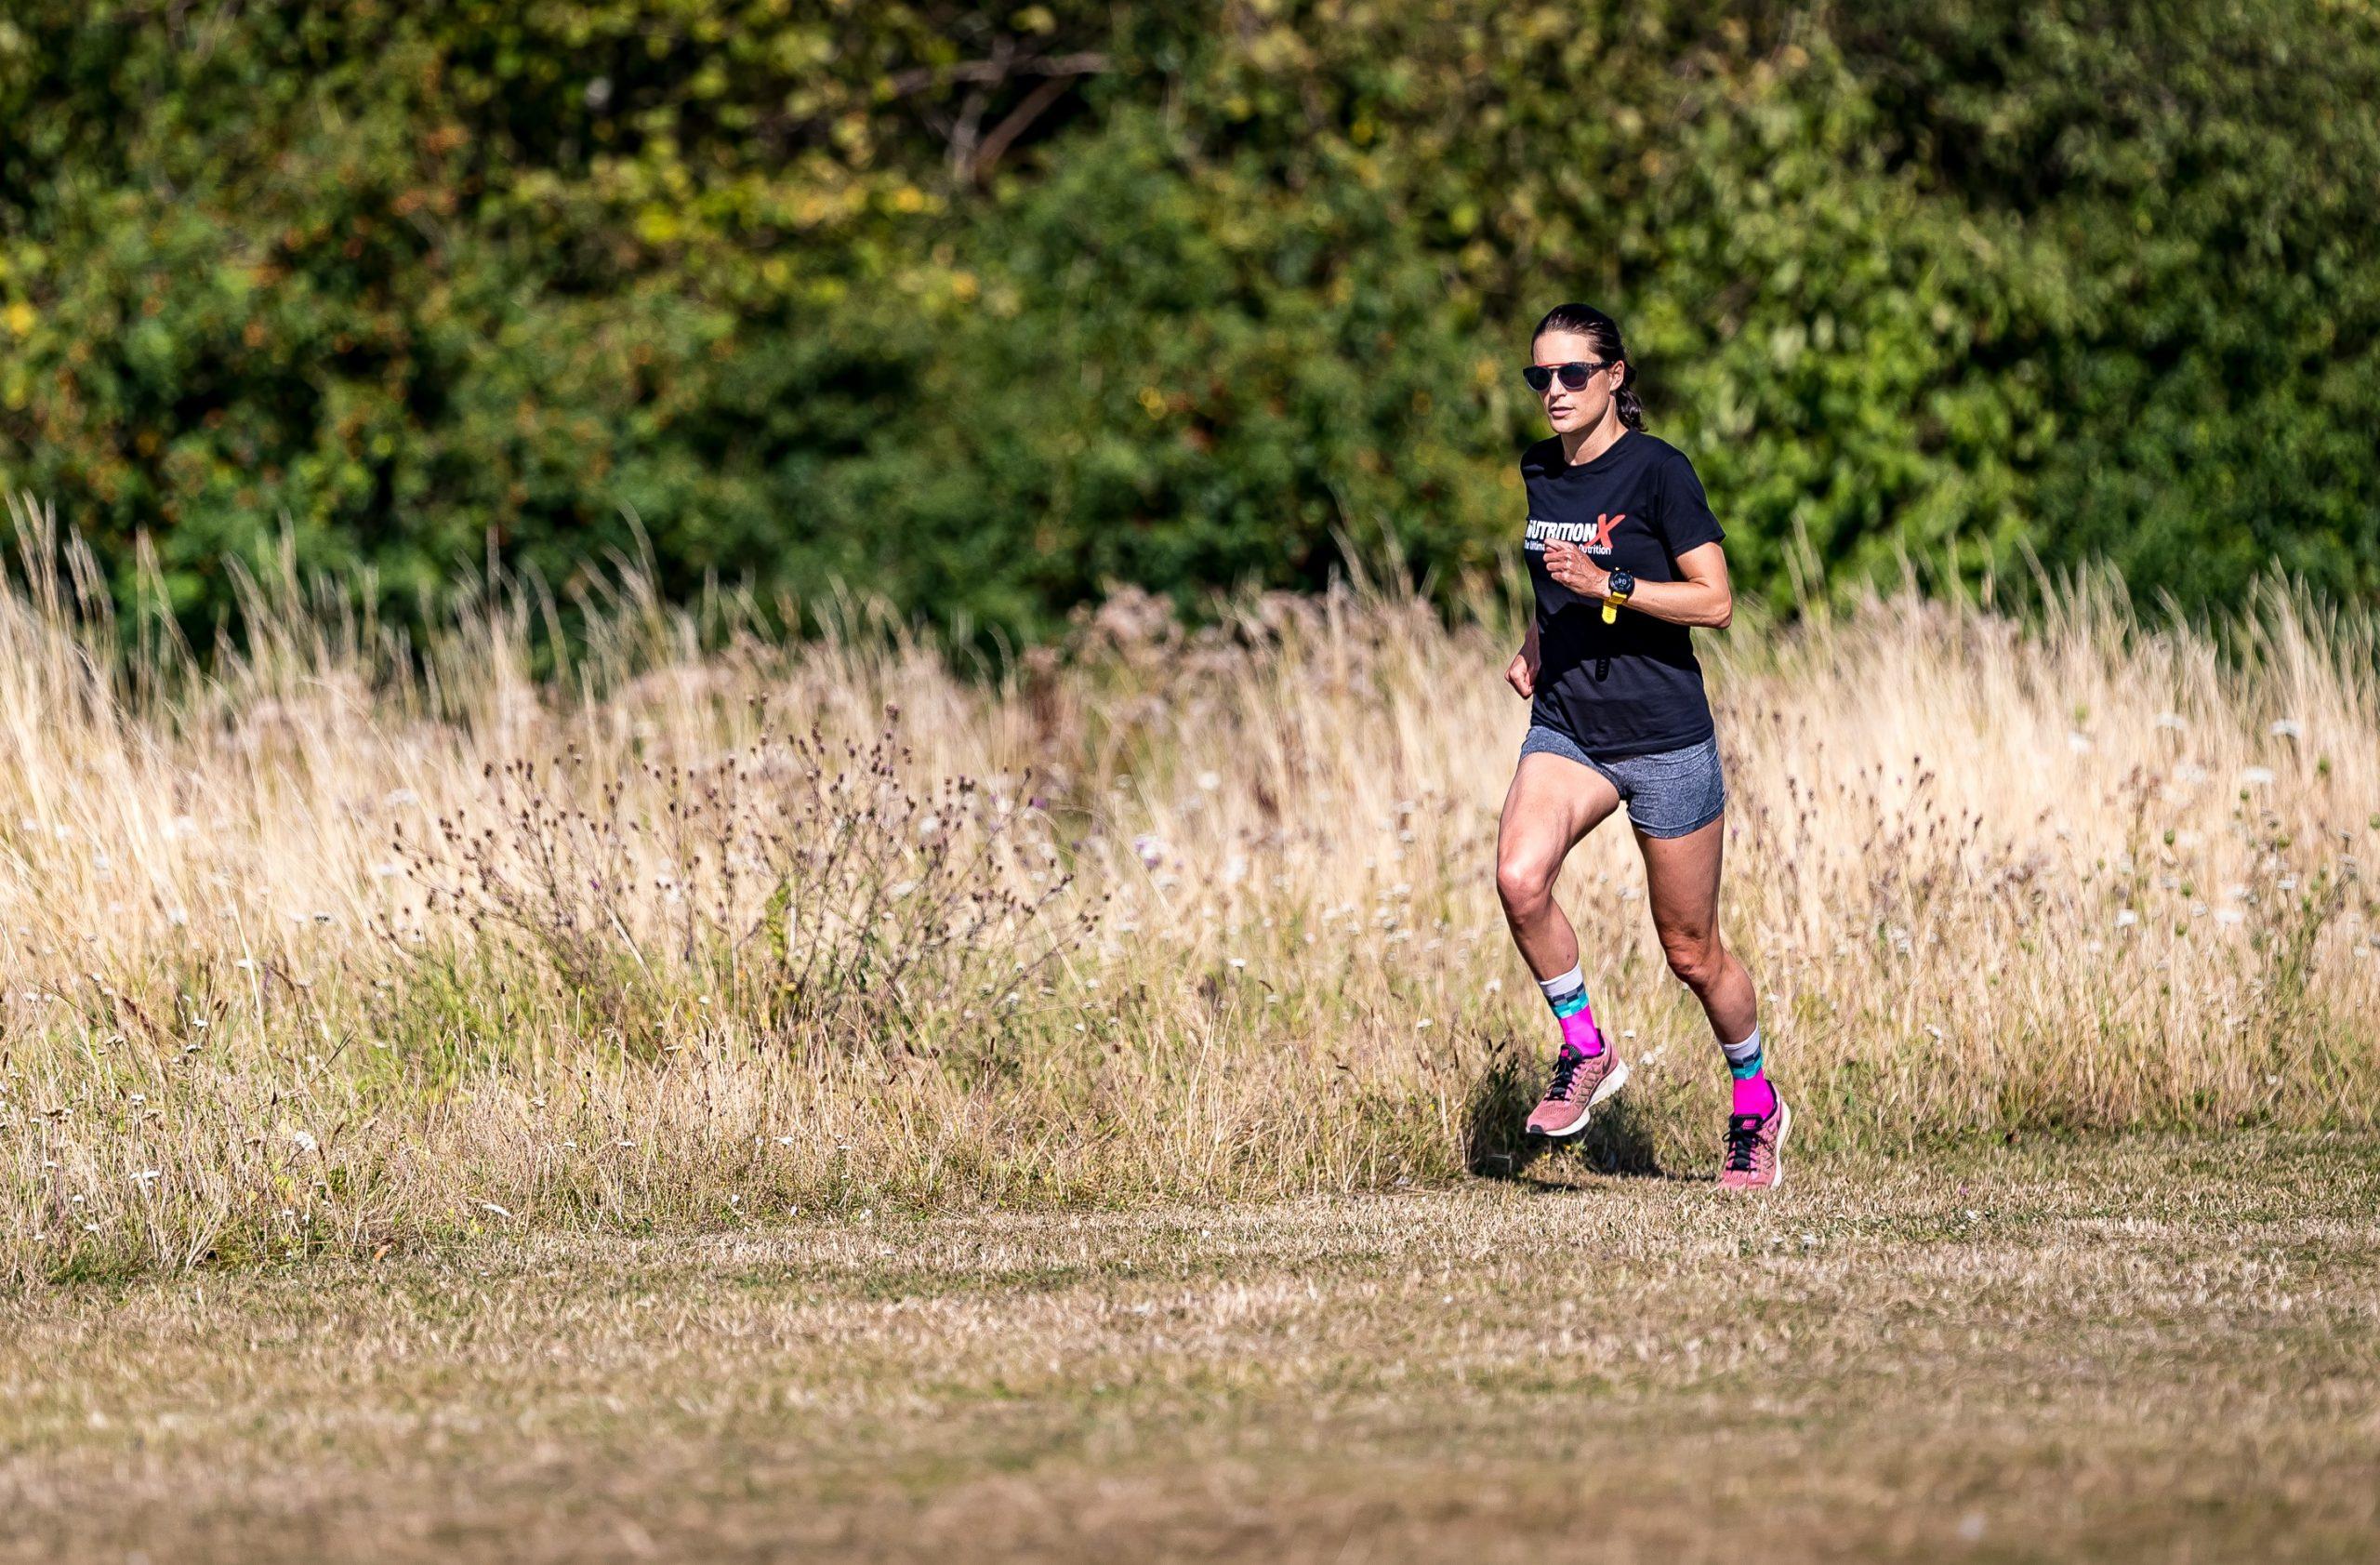 Triathlon vs Ultra Running - Why I Made the Switch